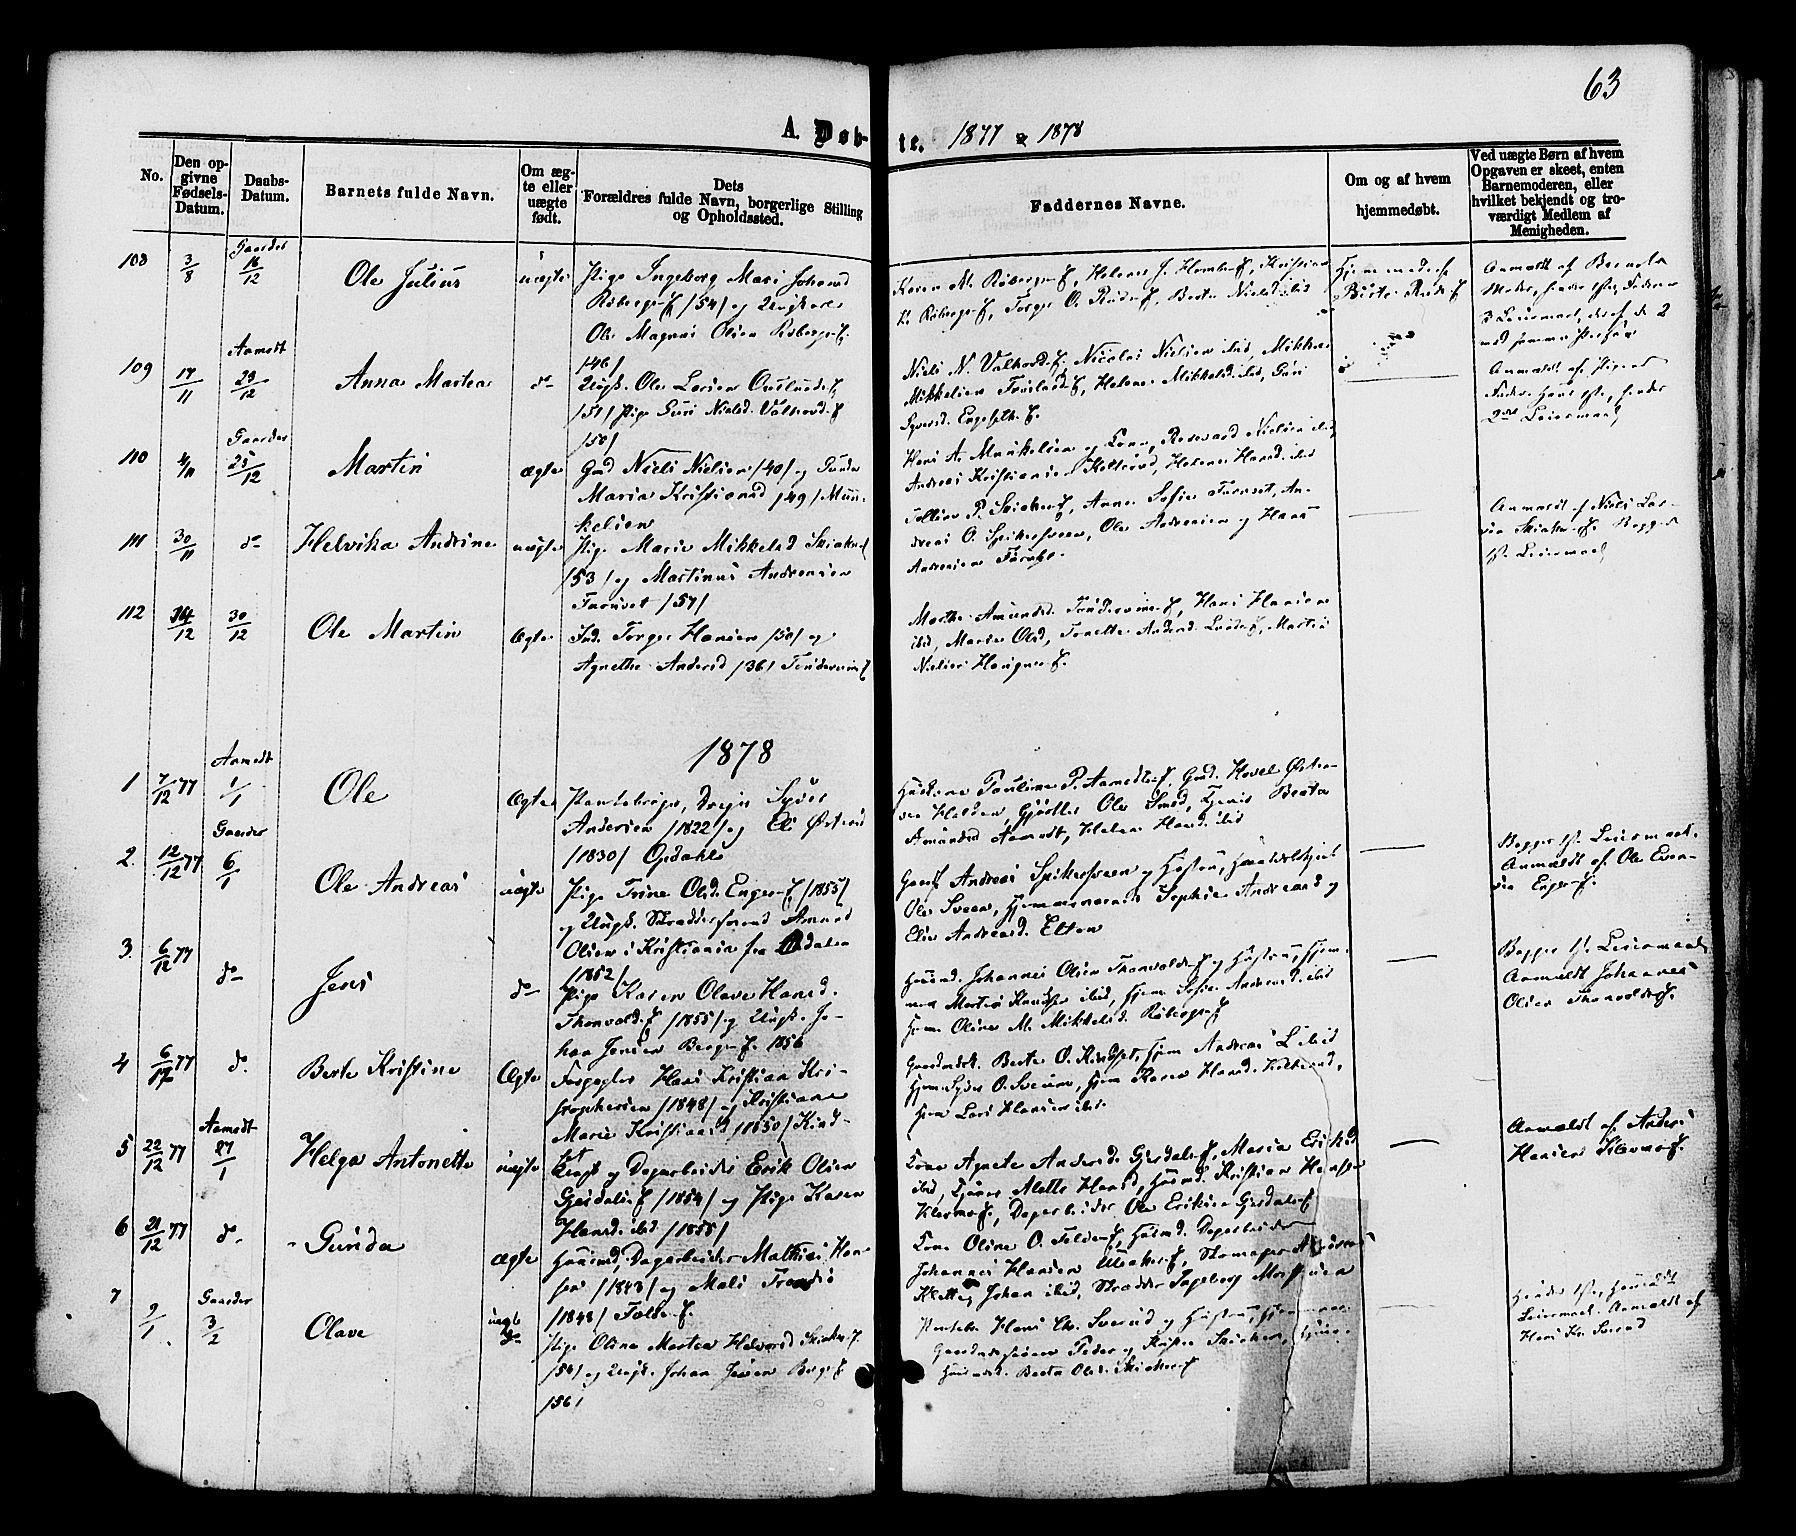 SAH, Nordre Land prestekontor, Ministerialbok nr. 2, 1872-1881, s. 63